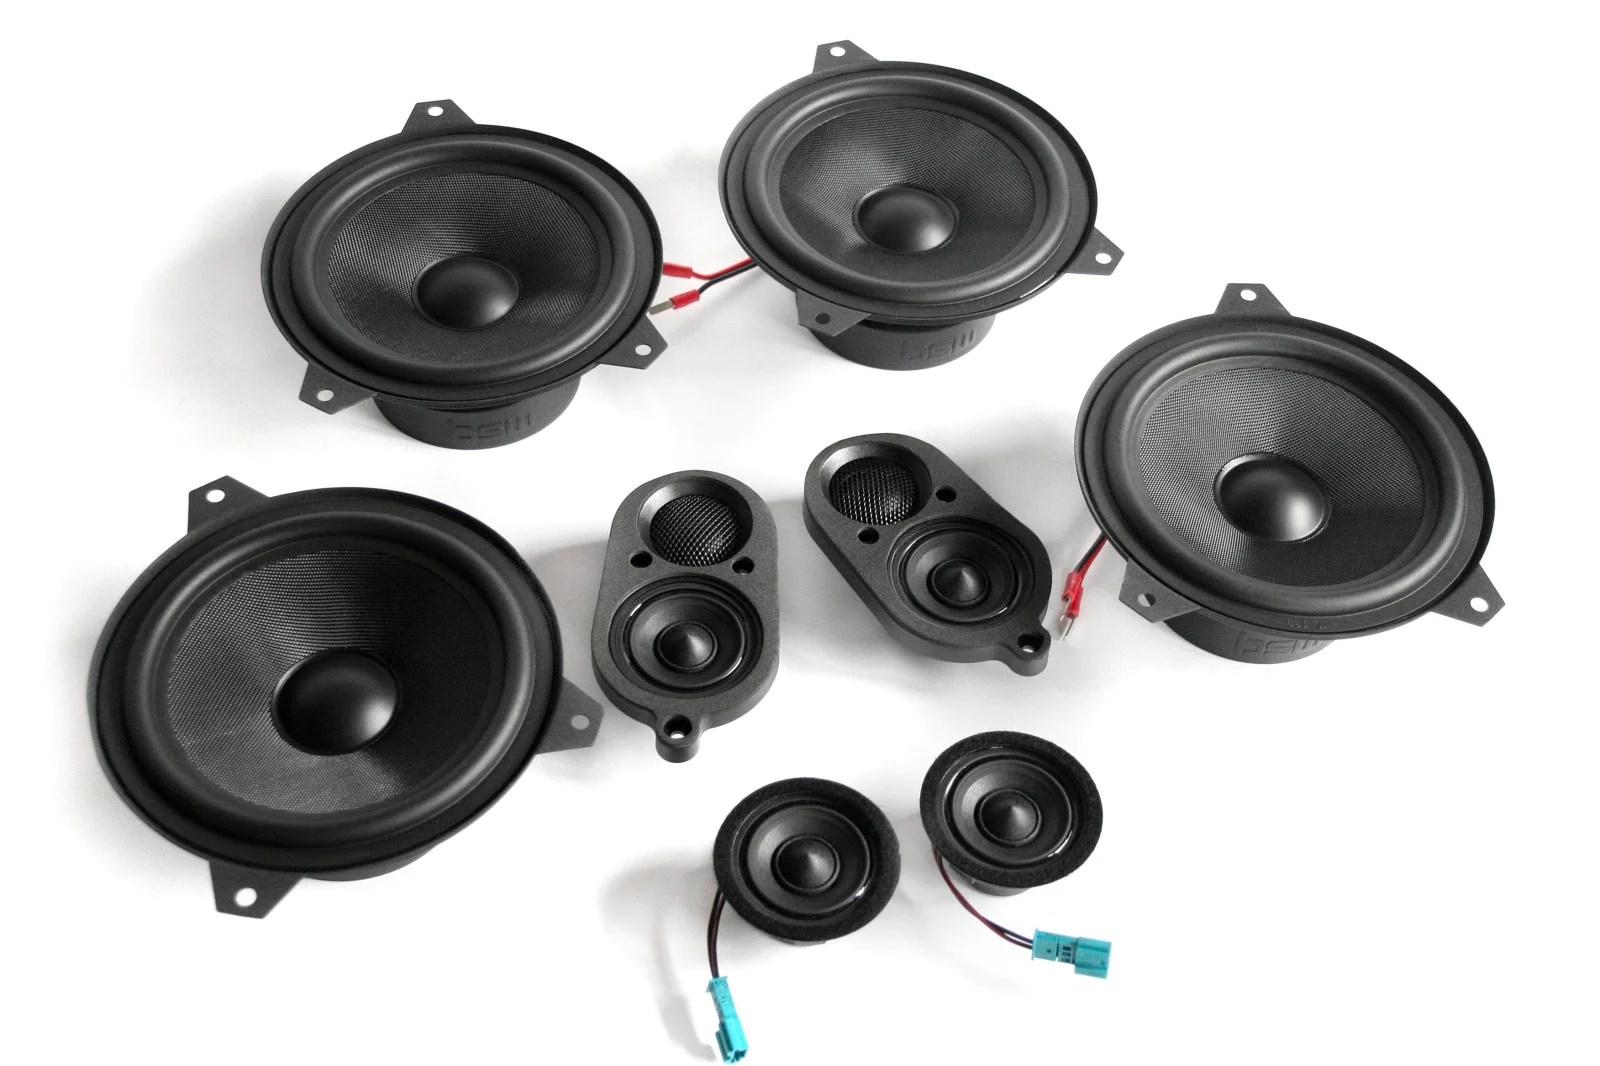 bmw speaker upgrade for e46 coupe with harman kardon [ 1600 x 1066 Pixel ]